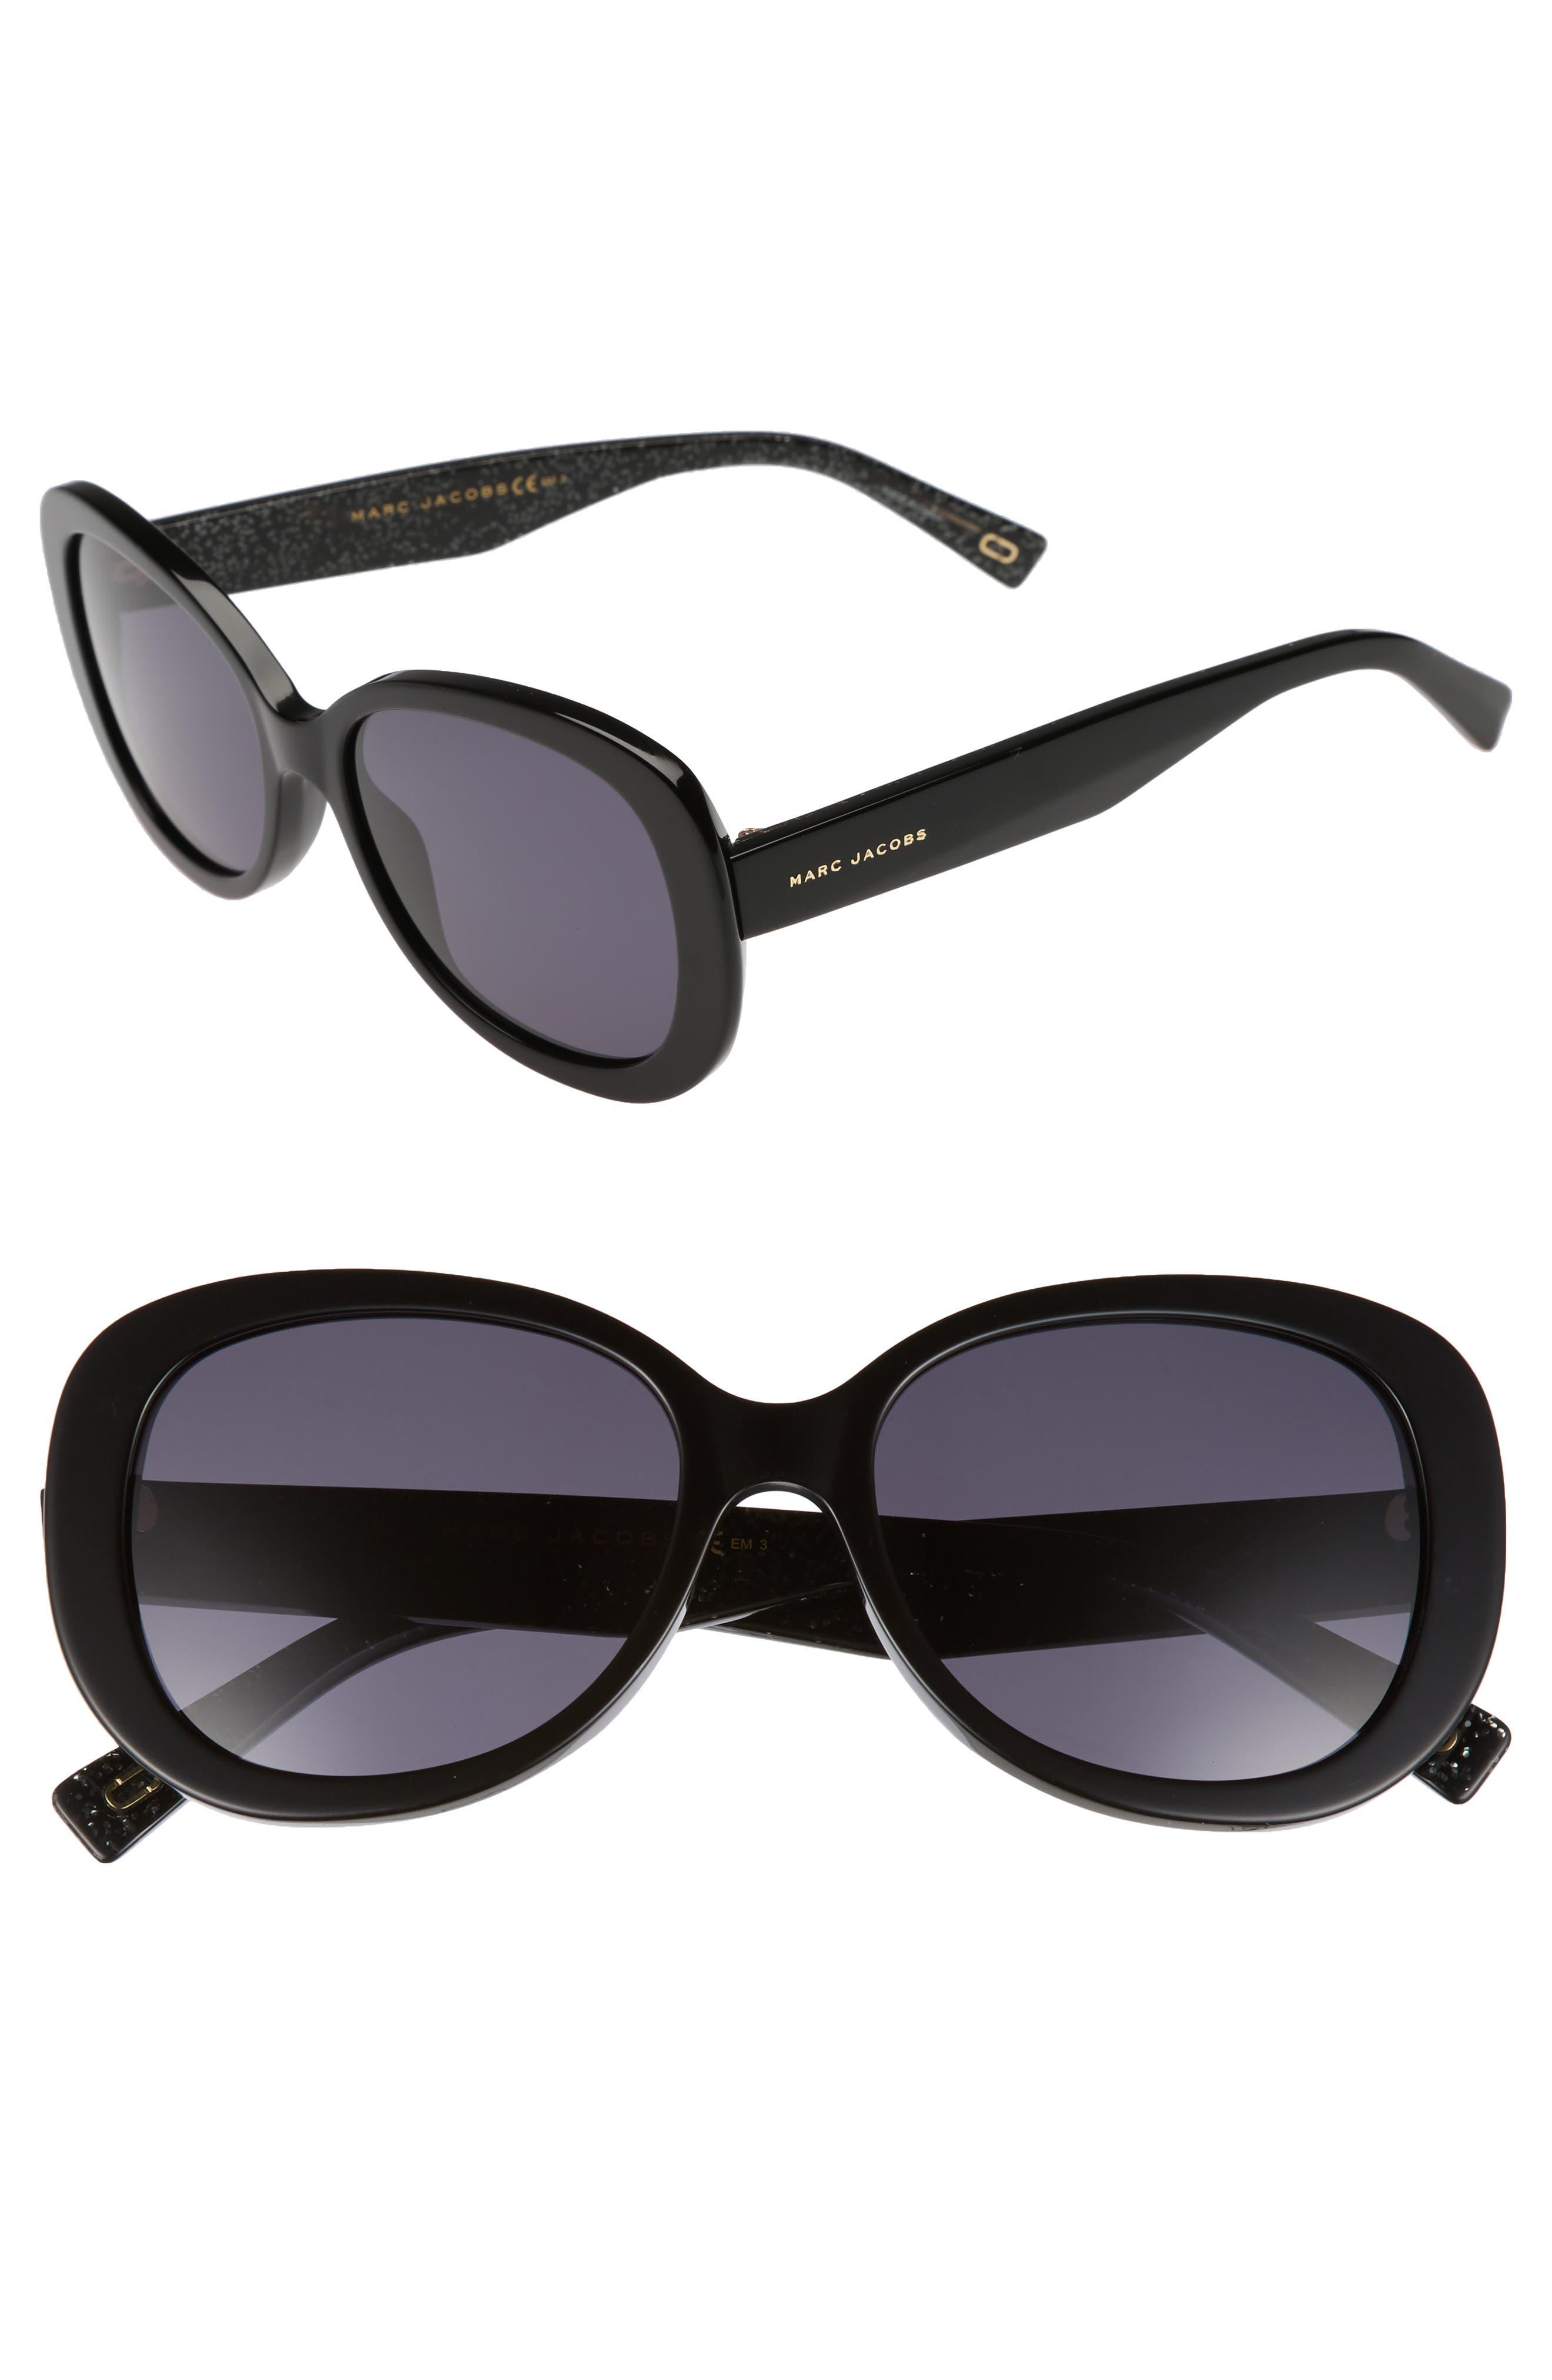 56mm Butterfly Sunglasses,                             Main thumbnail 1, color,                             BLACK GLITTER